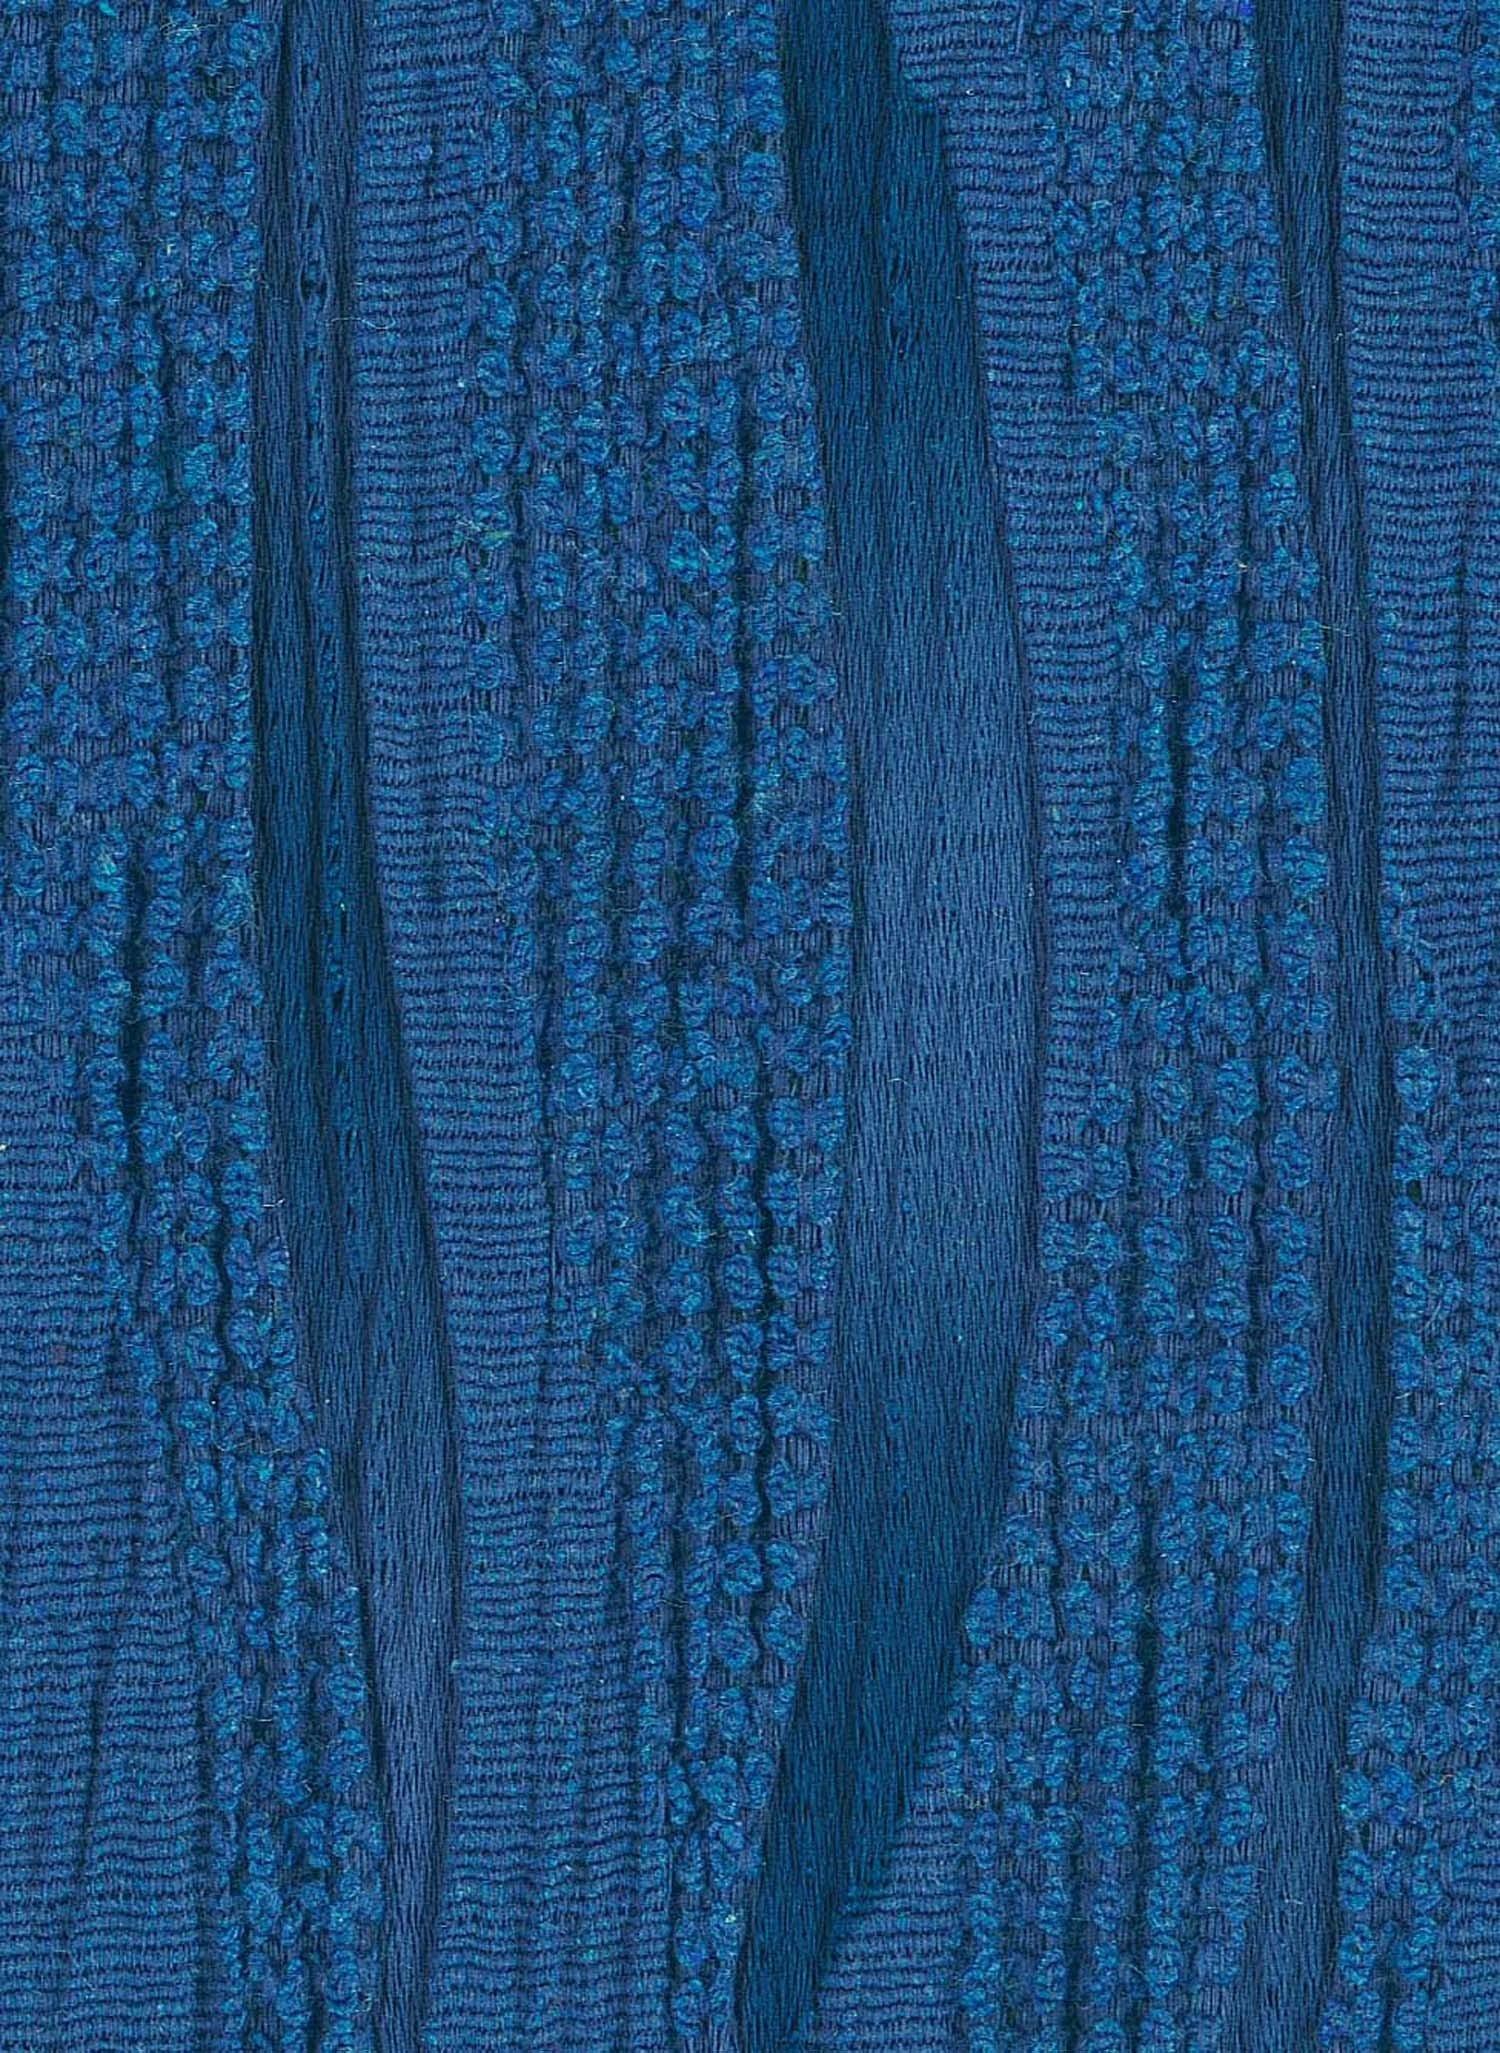 Schonbezug,Fauteuil blau - 1 - Ronja.ch